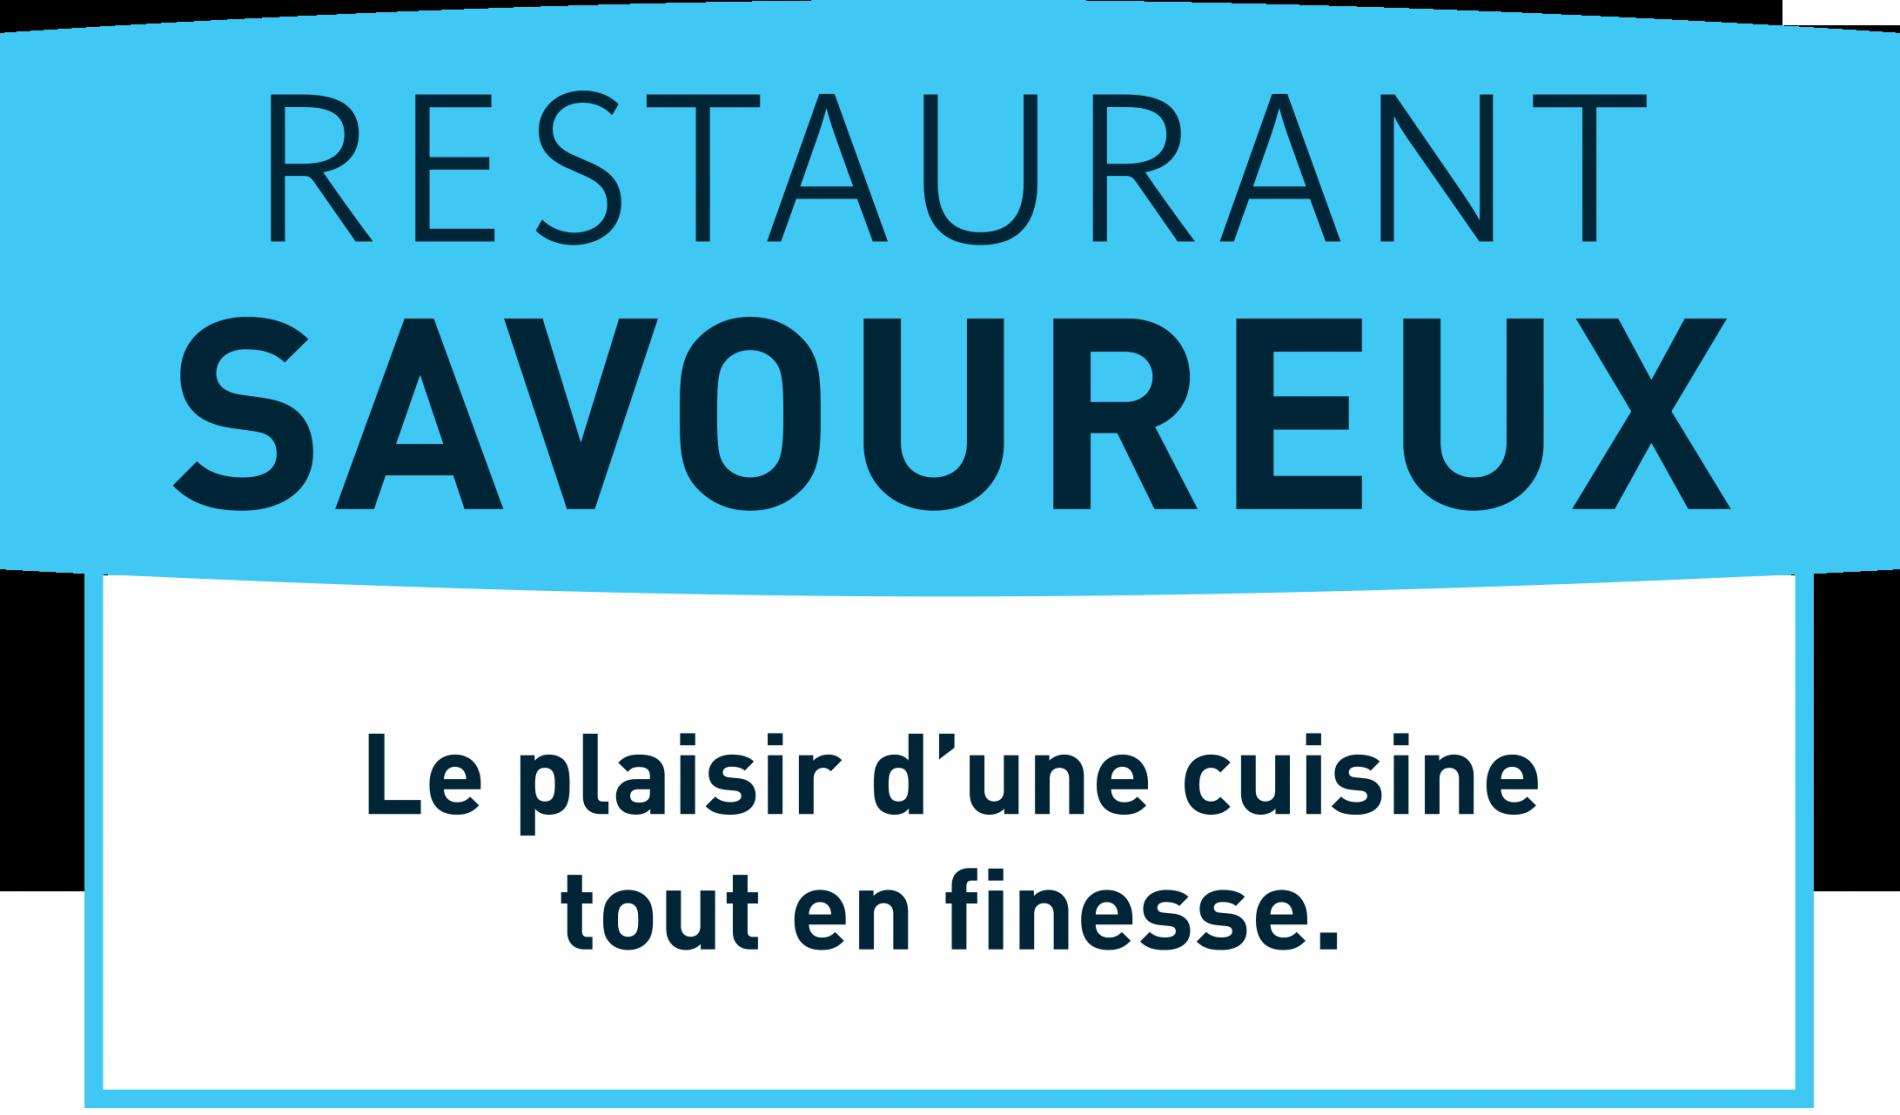 Logo Logis restaurant savoureux Breiz-Armor, Bretagne